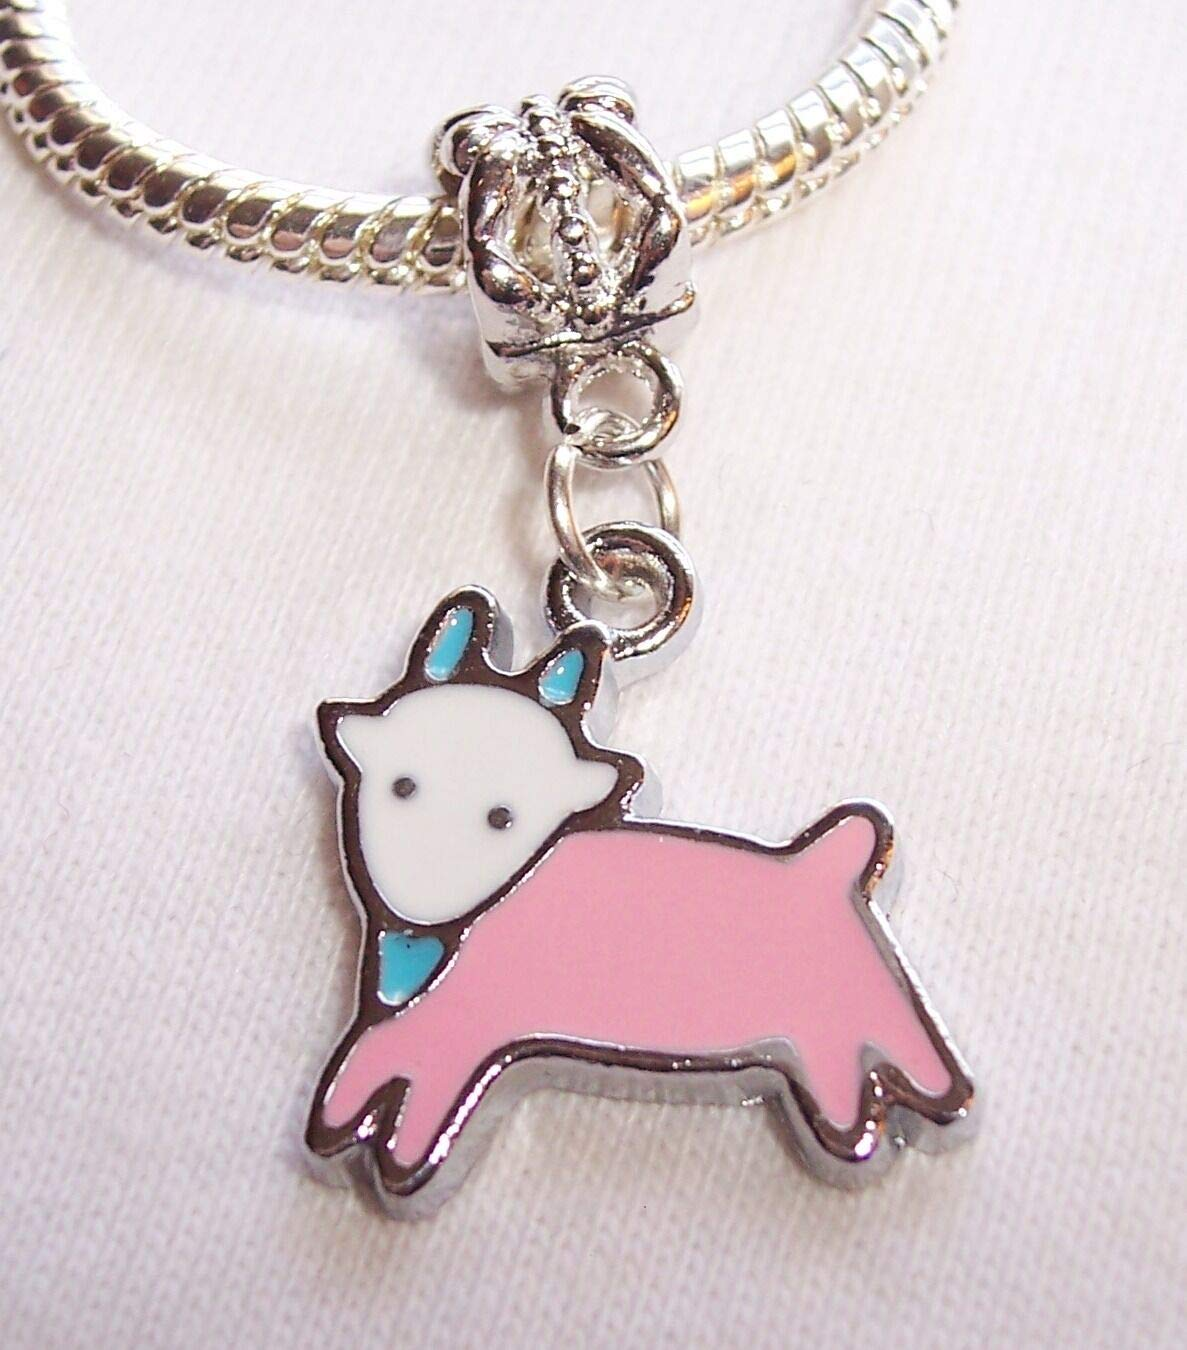 Zodiac Capricorn The Goat Pink Enamel Dangle Bead for European Charm Bracelets id-2264